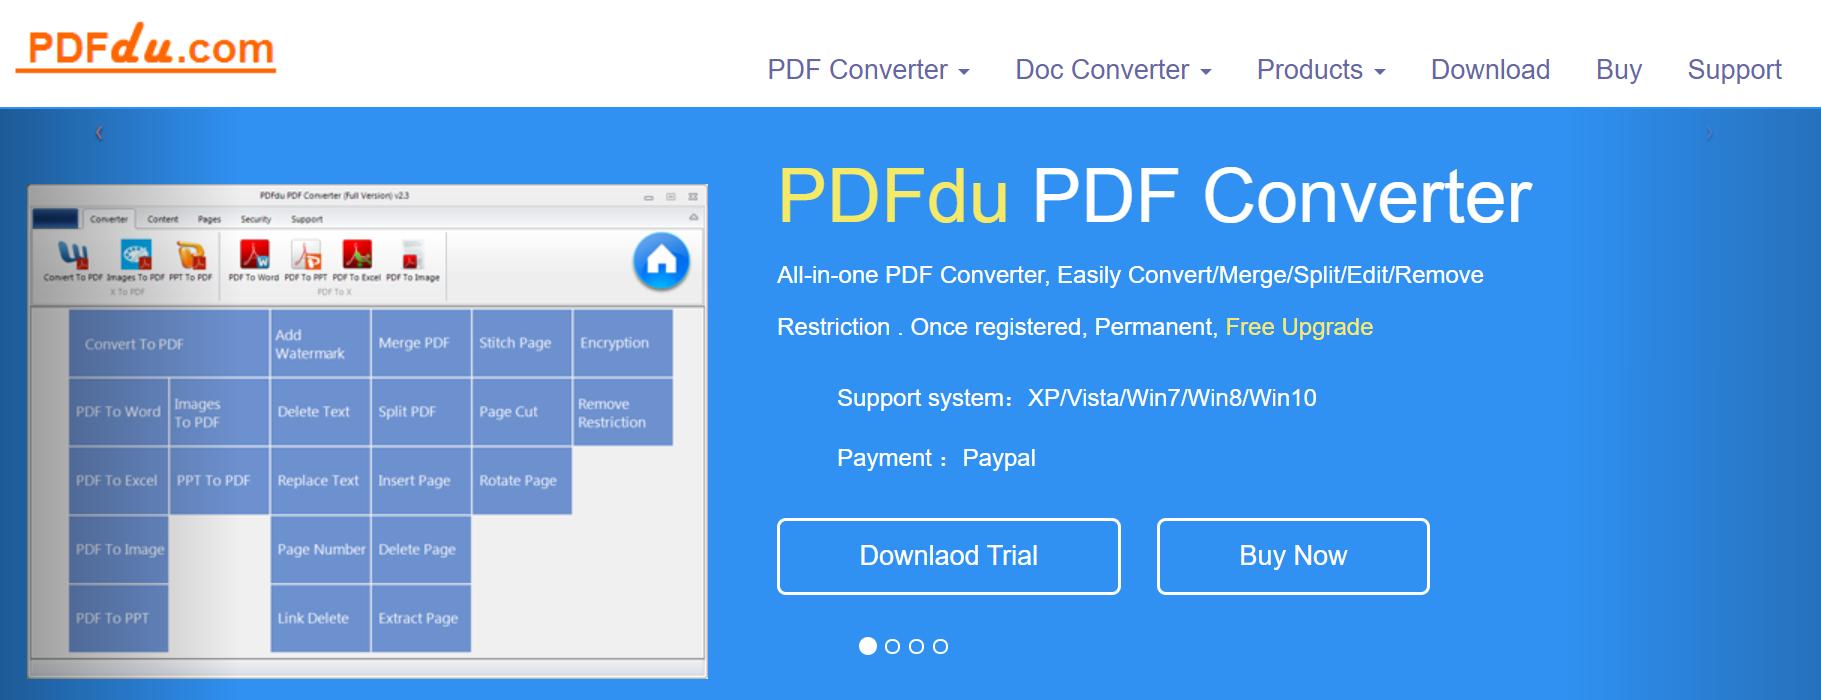 pdfdu-watermark-remover